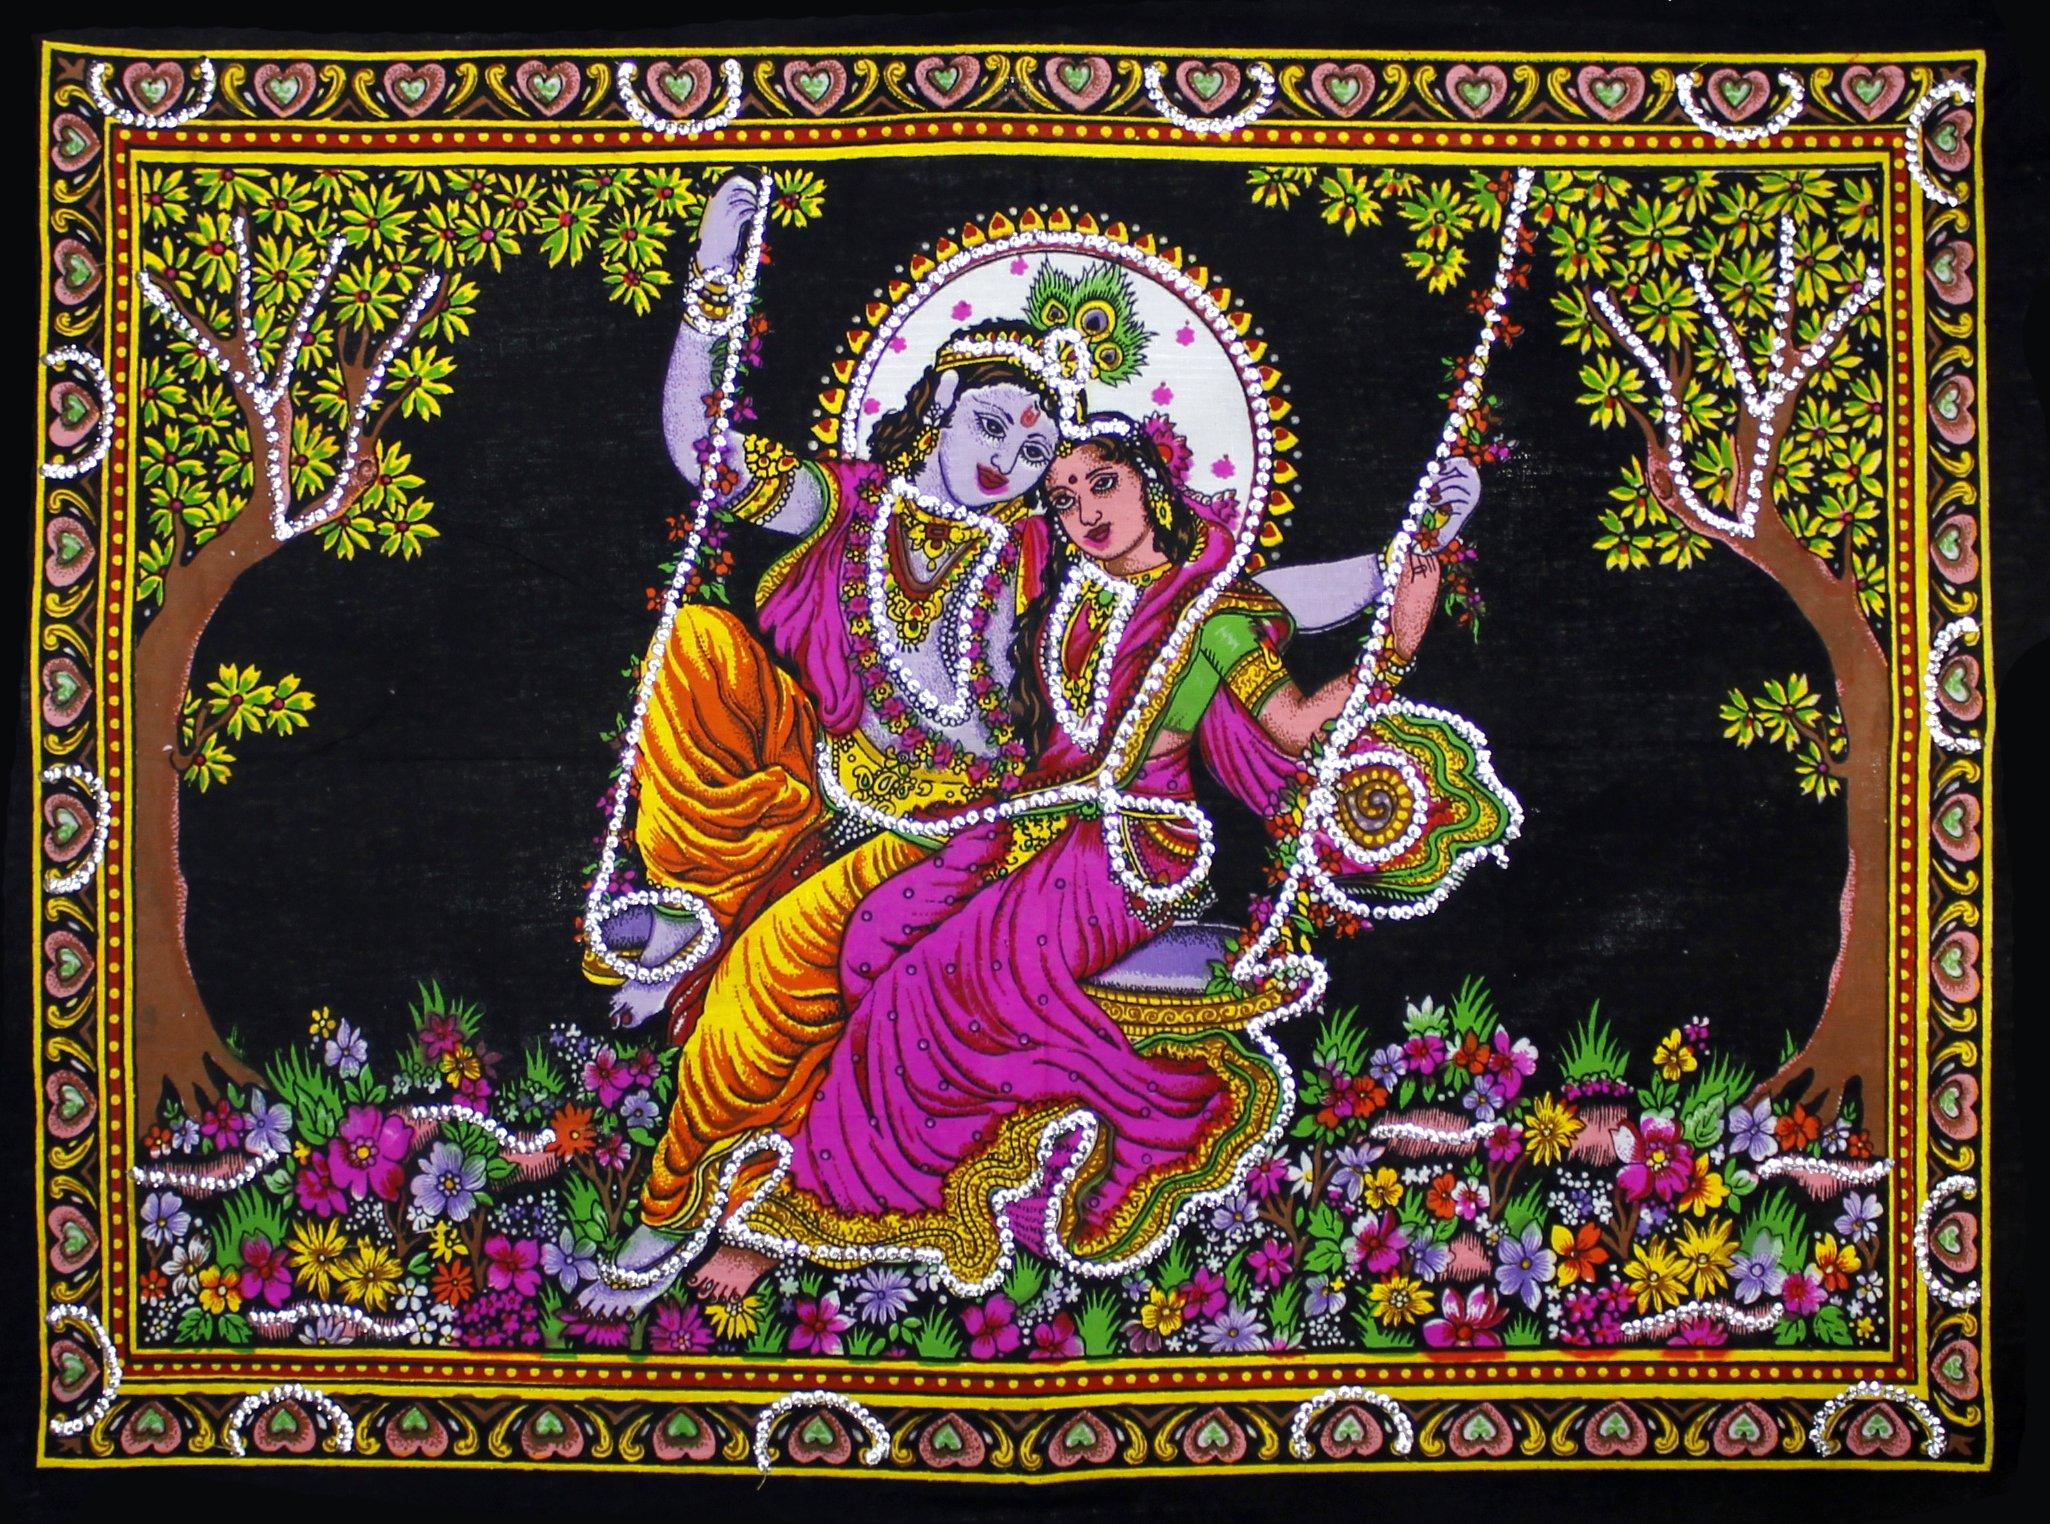 Lord Krishna & Goddess Radha Sequin Sitara Batik Cotton Wall Tapestry 22'' X 16'' (Small)